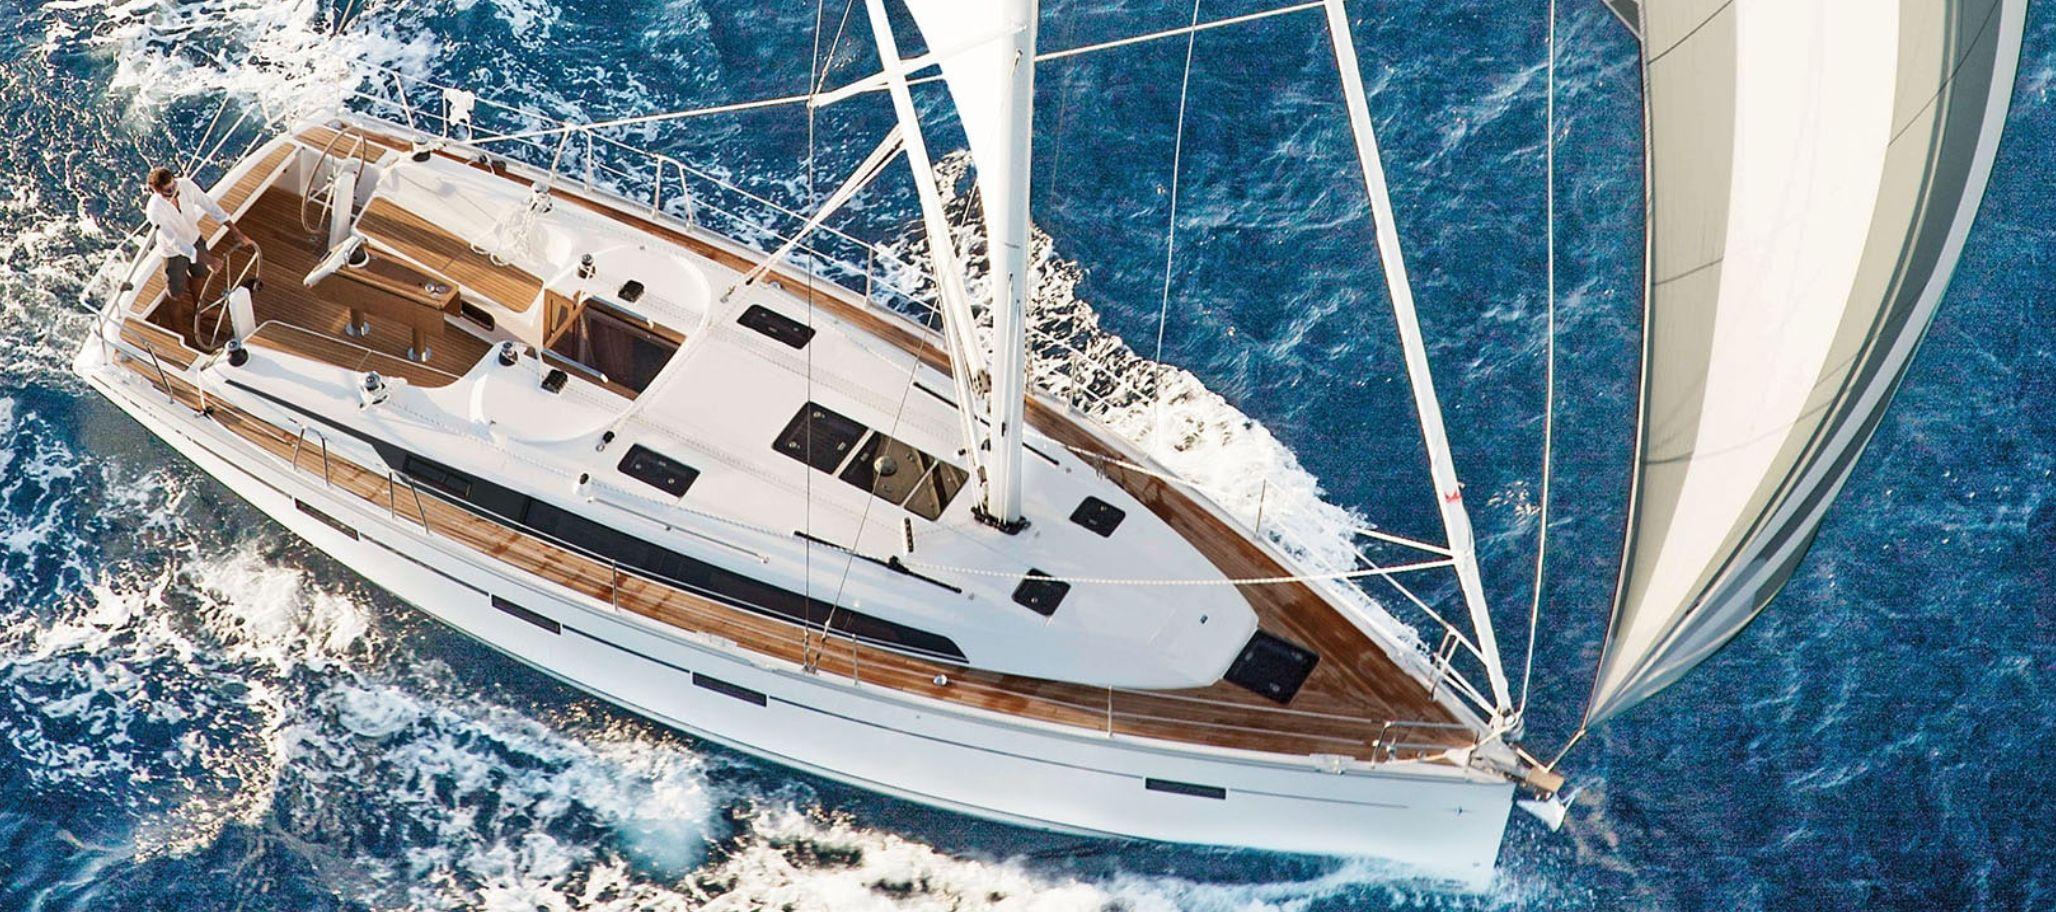 Bavaria Cruiser 41 - 3 Cabins - 2019 - Gocek - Marmaris - Bodrum